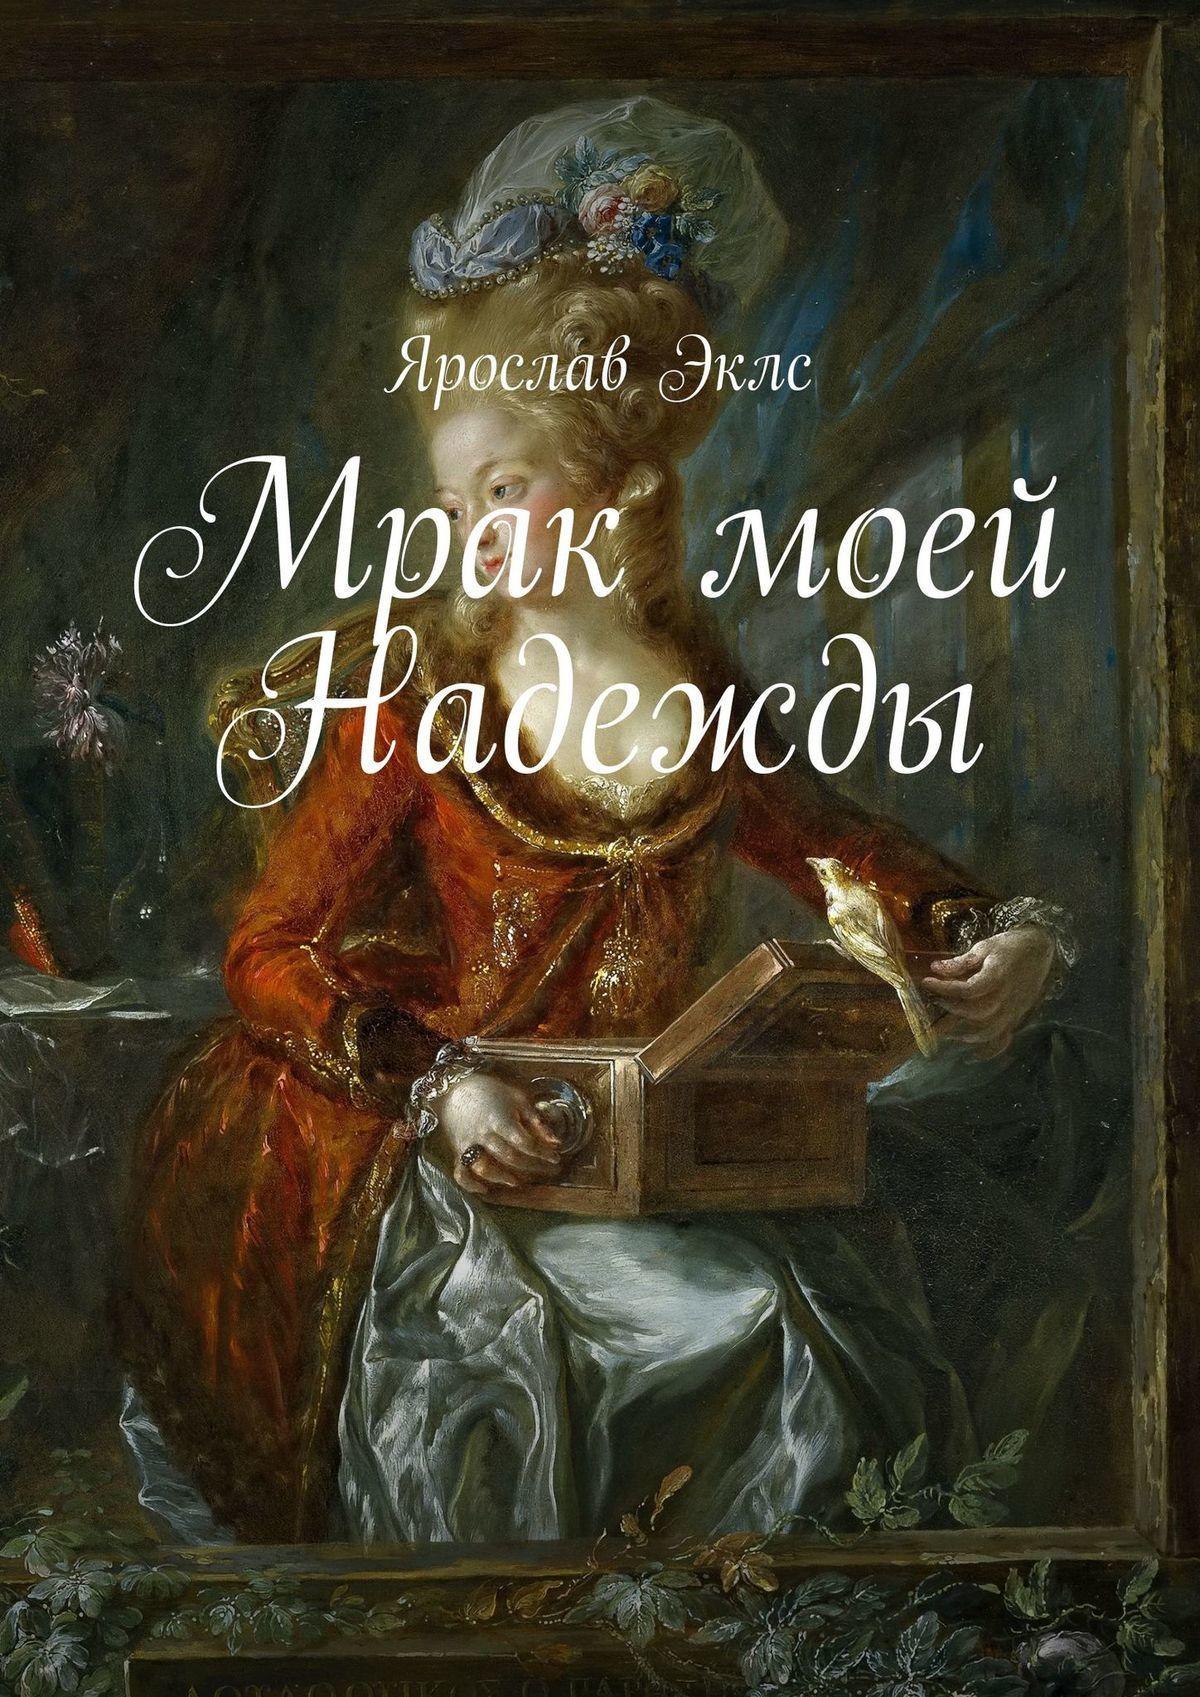 Ярослав Эклс - Мрак моей Надежды